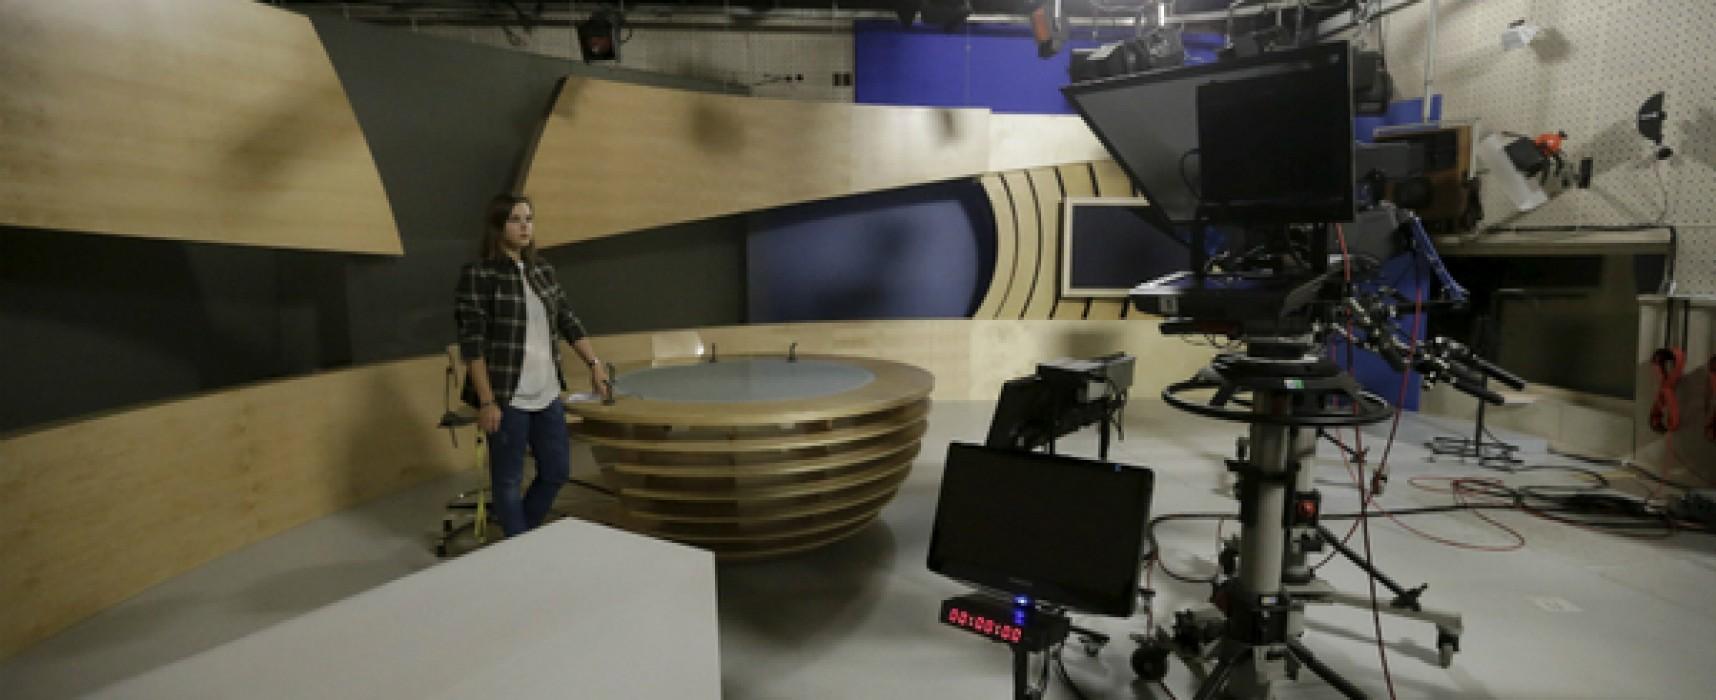 To combat Kremlin's message, West gets into Russian broadcasting biz